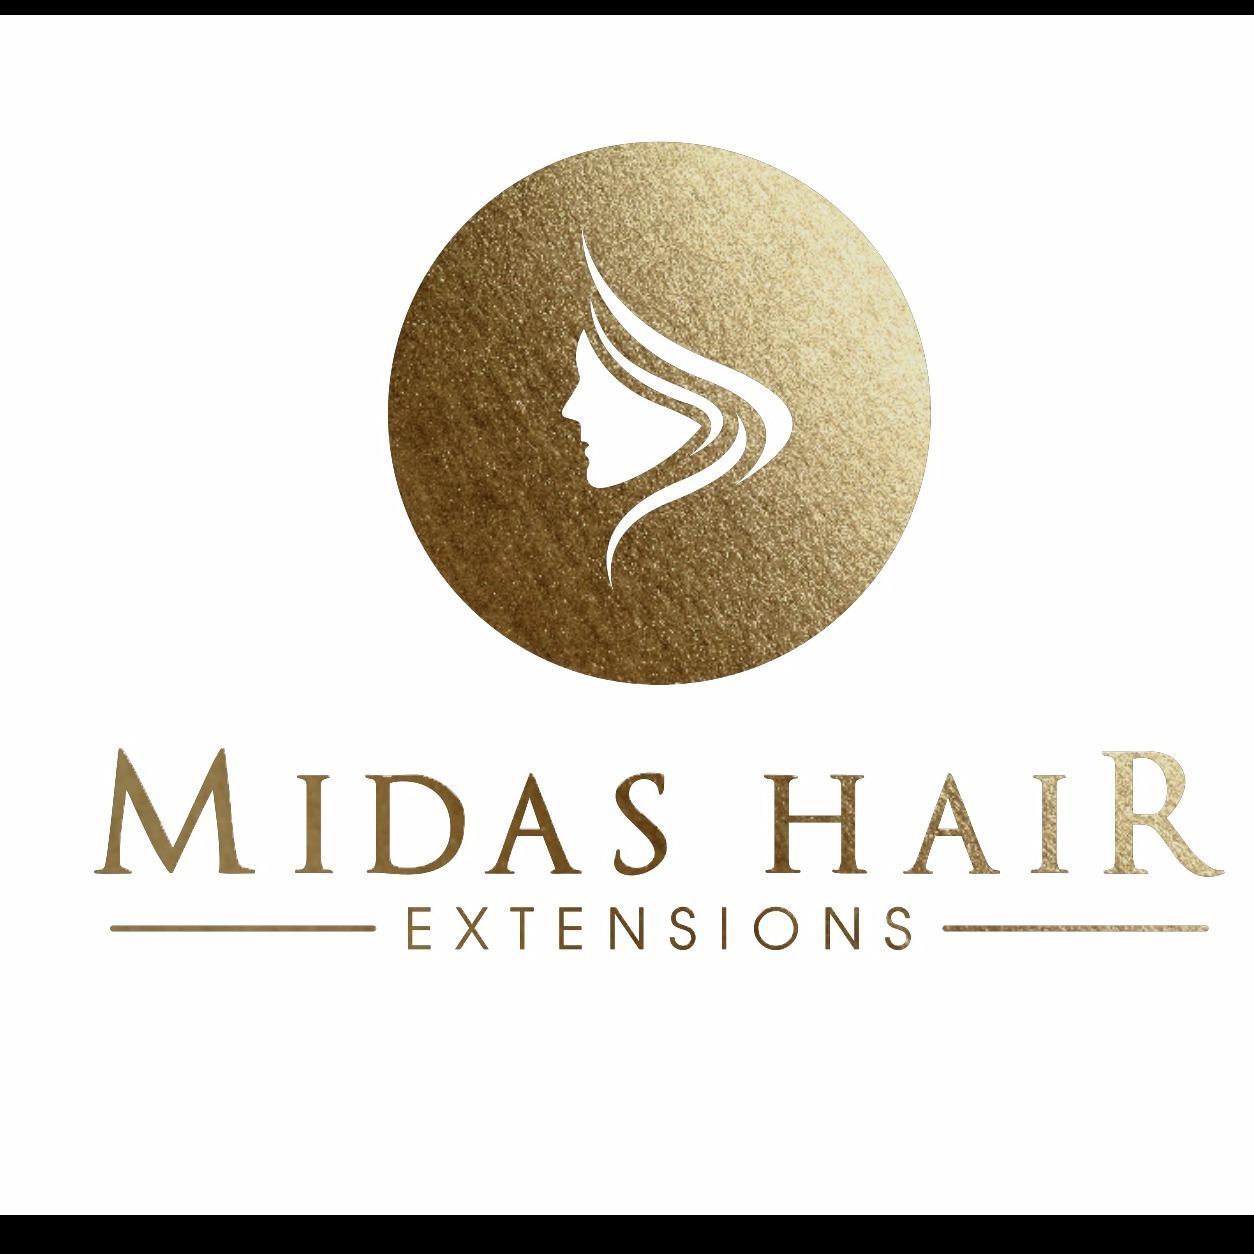 Midas Hair extensions